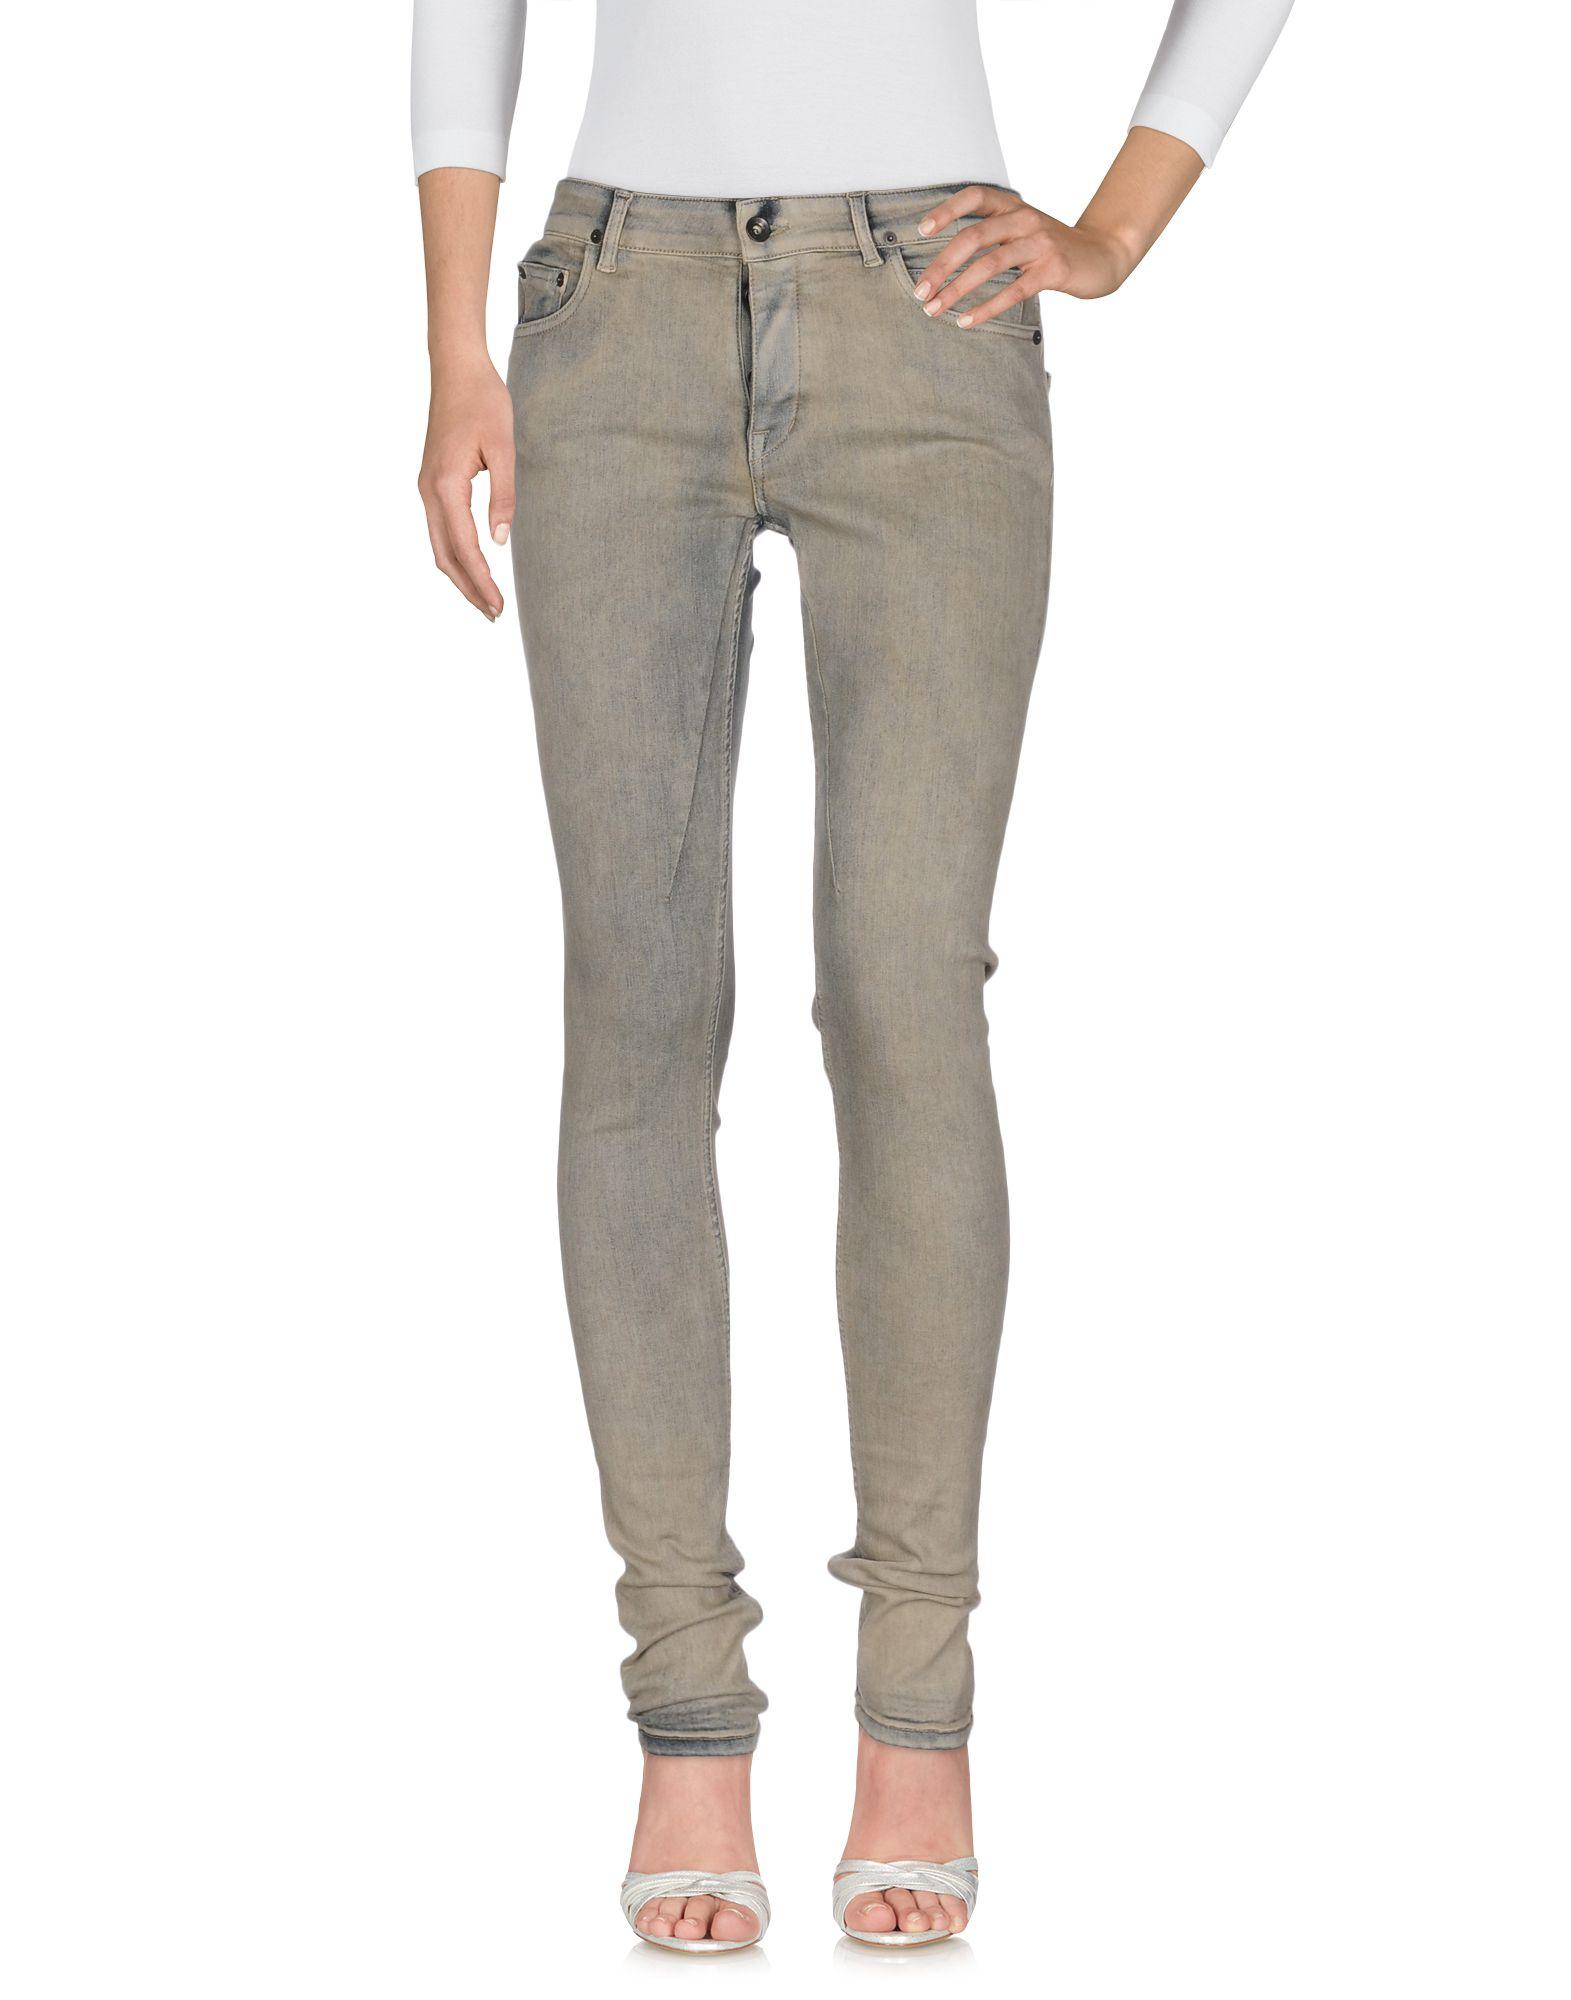 Pantaloni Jeans Drkshdw By Rick Owens donna donna donna - 42644393DL 9cf